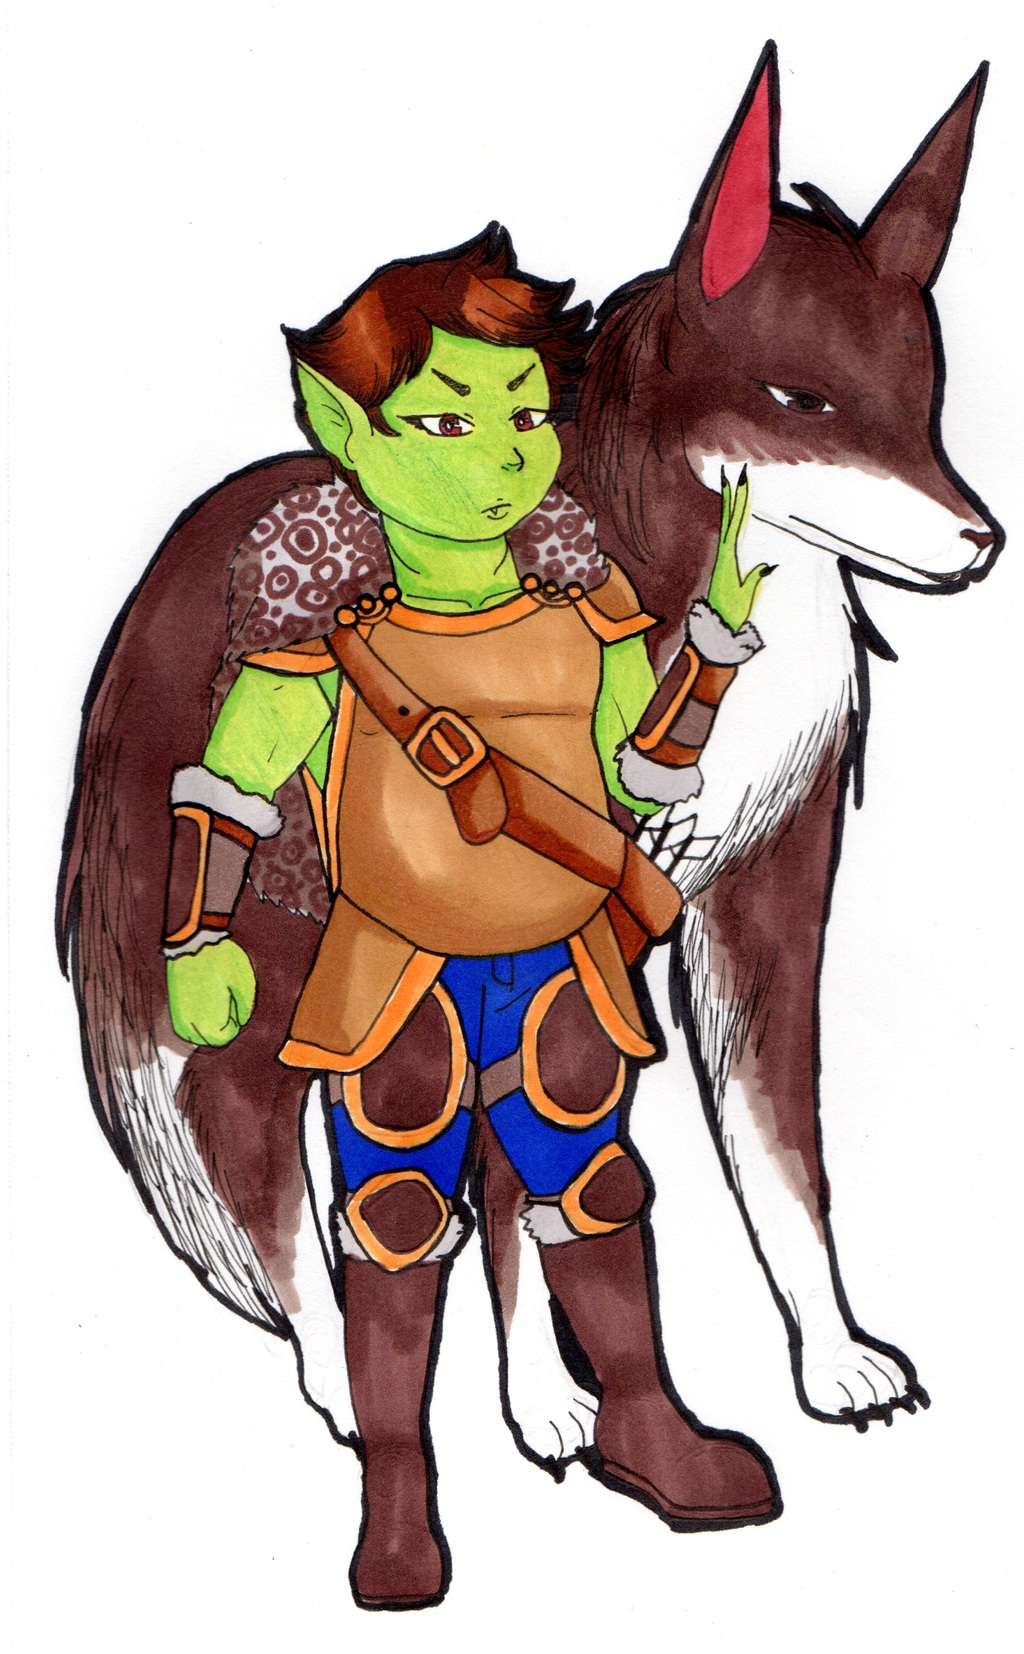 Taabu Thunderfoot the Half-Orc Ranger